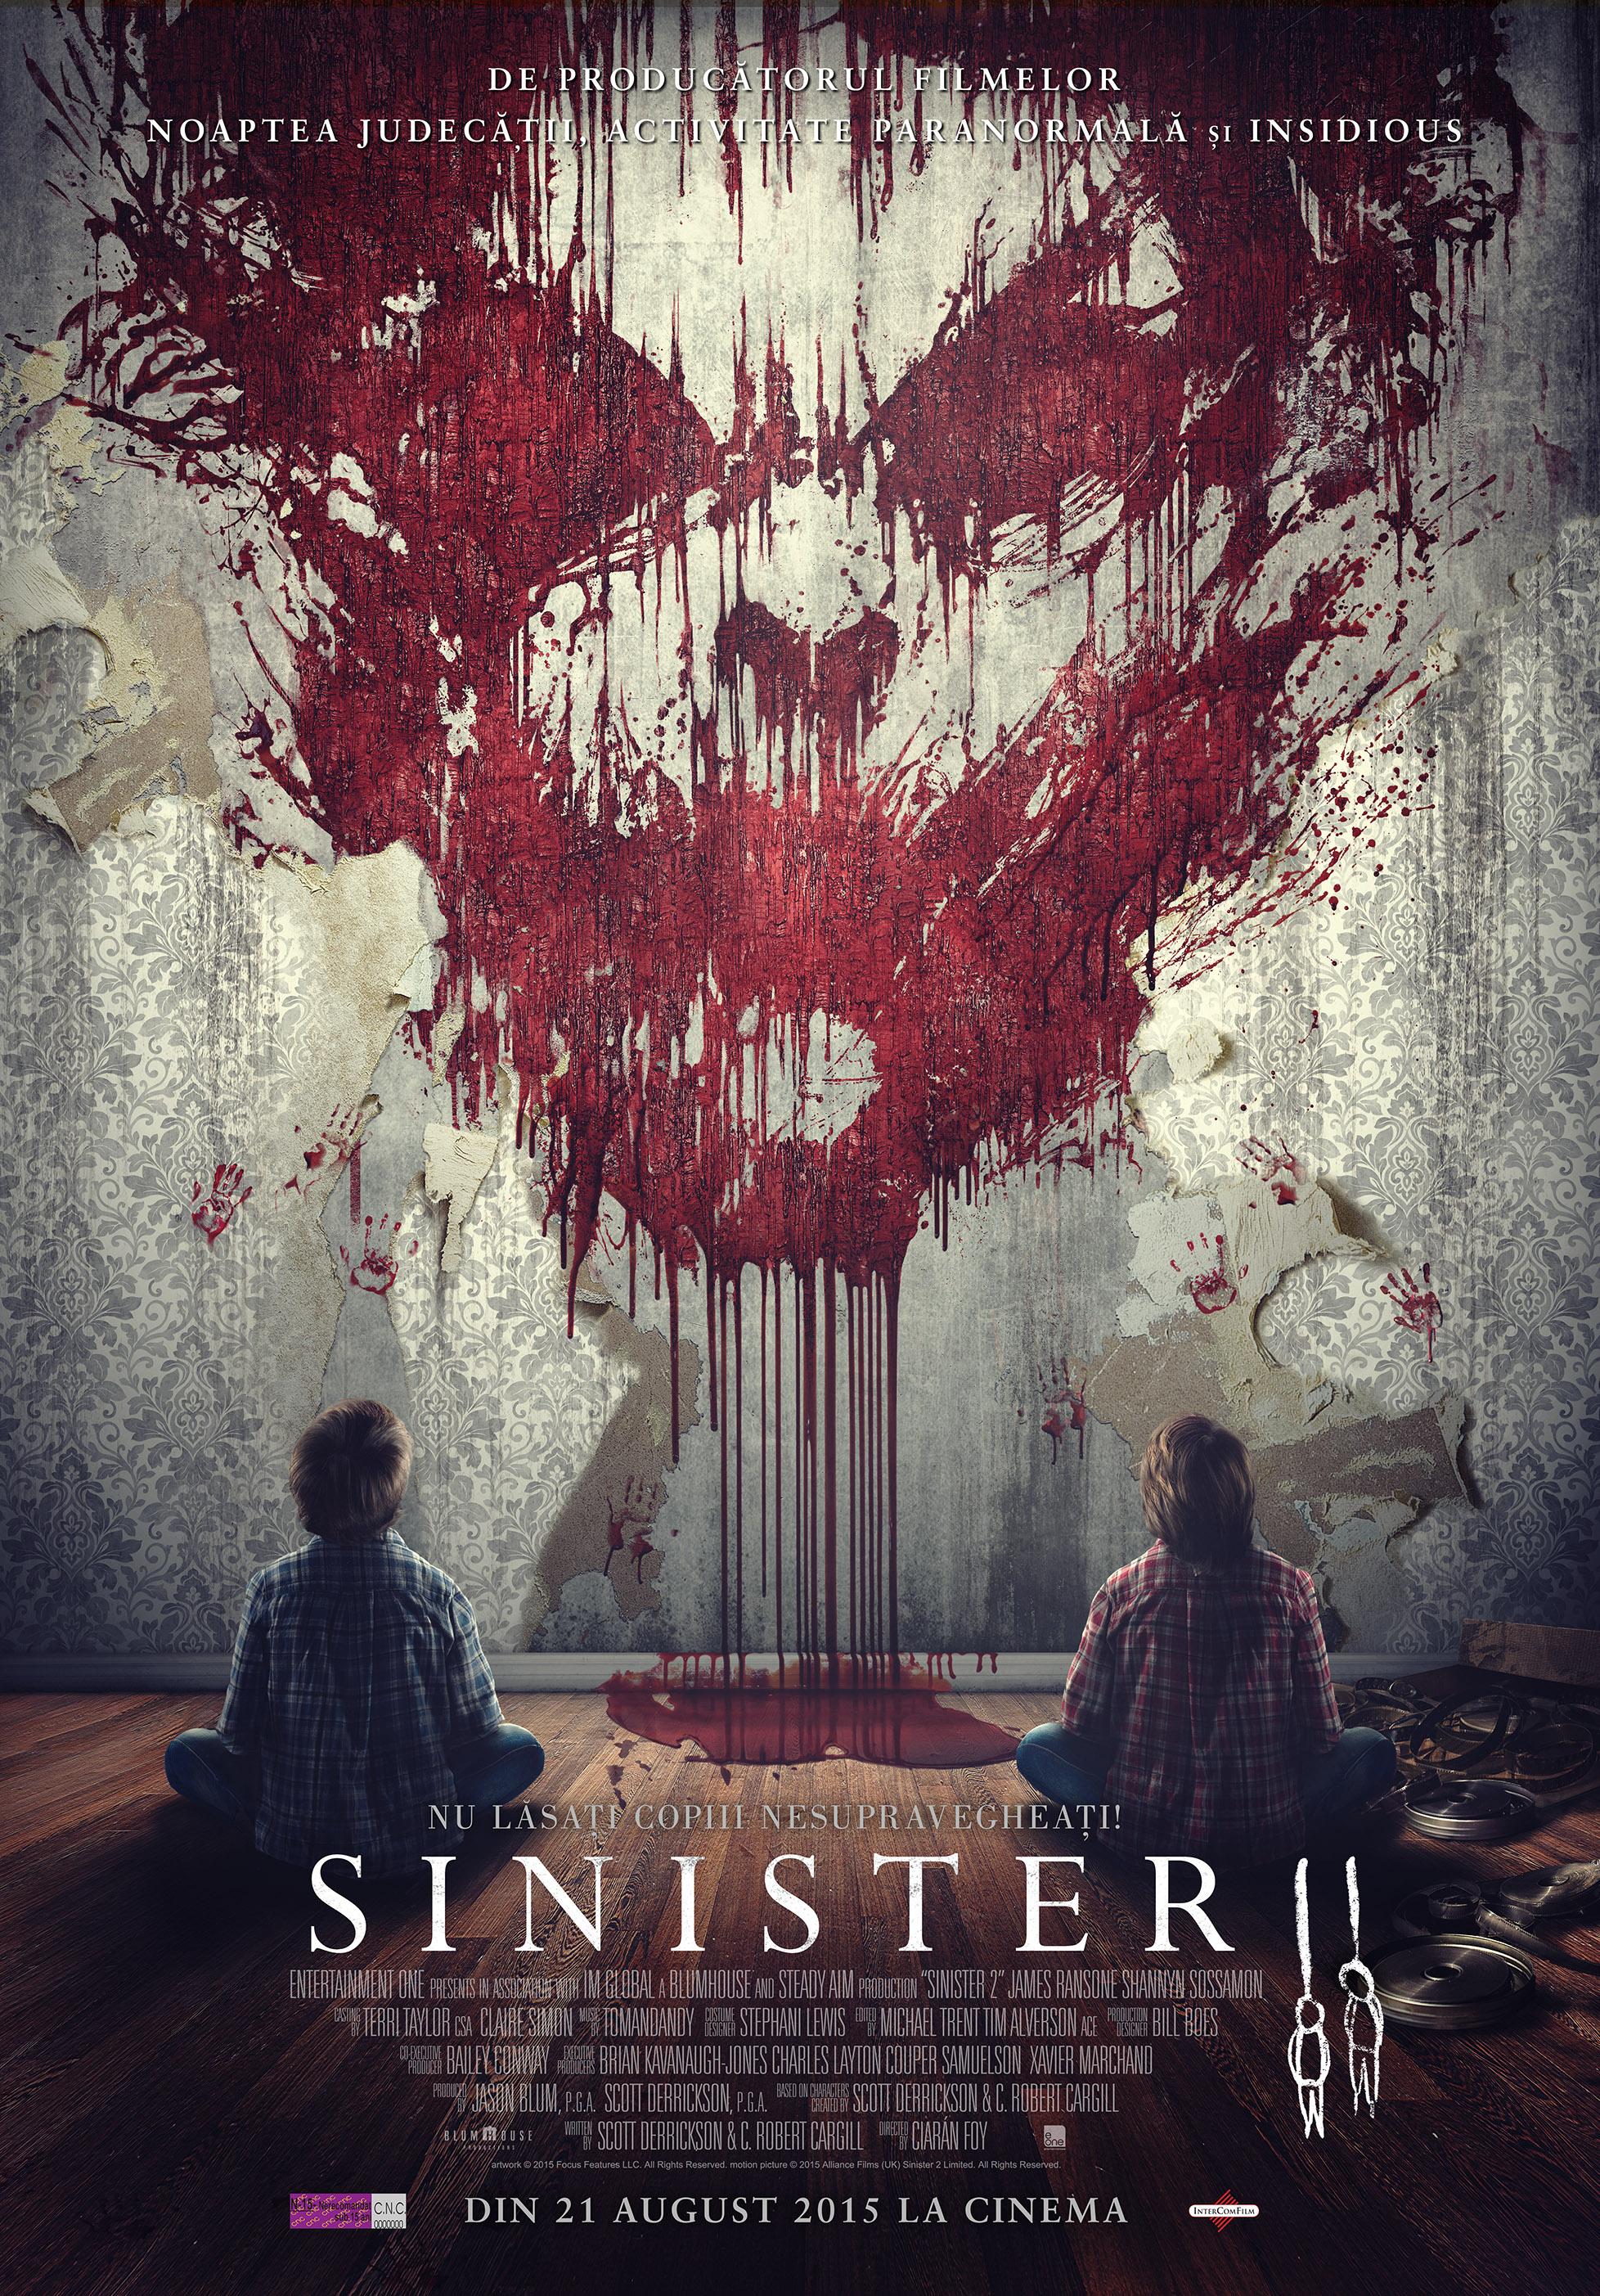 Sinister 2 (Premiera)